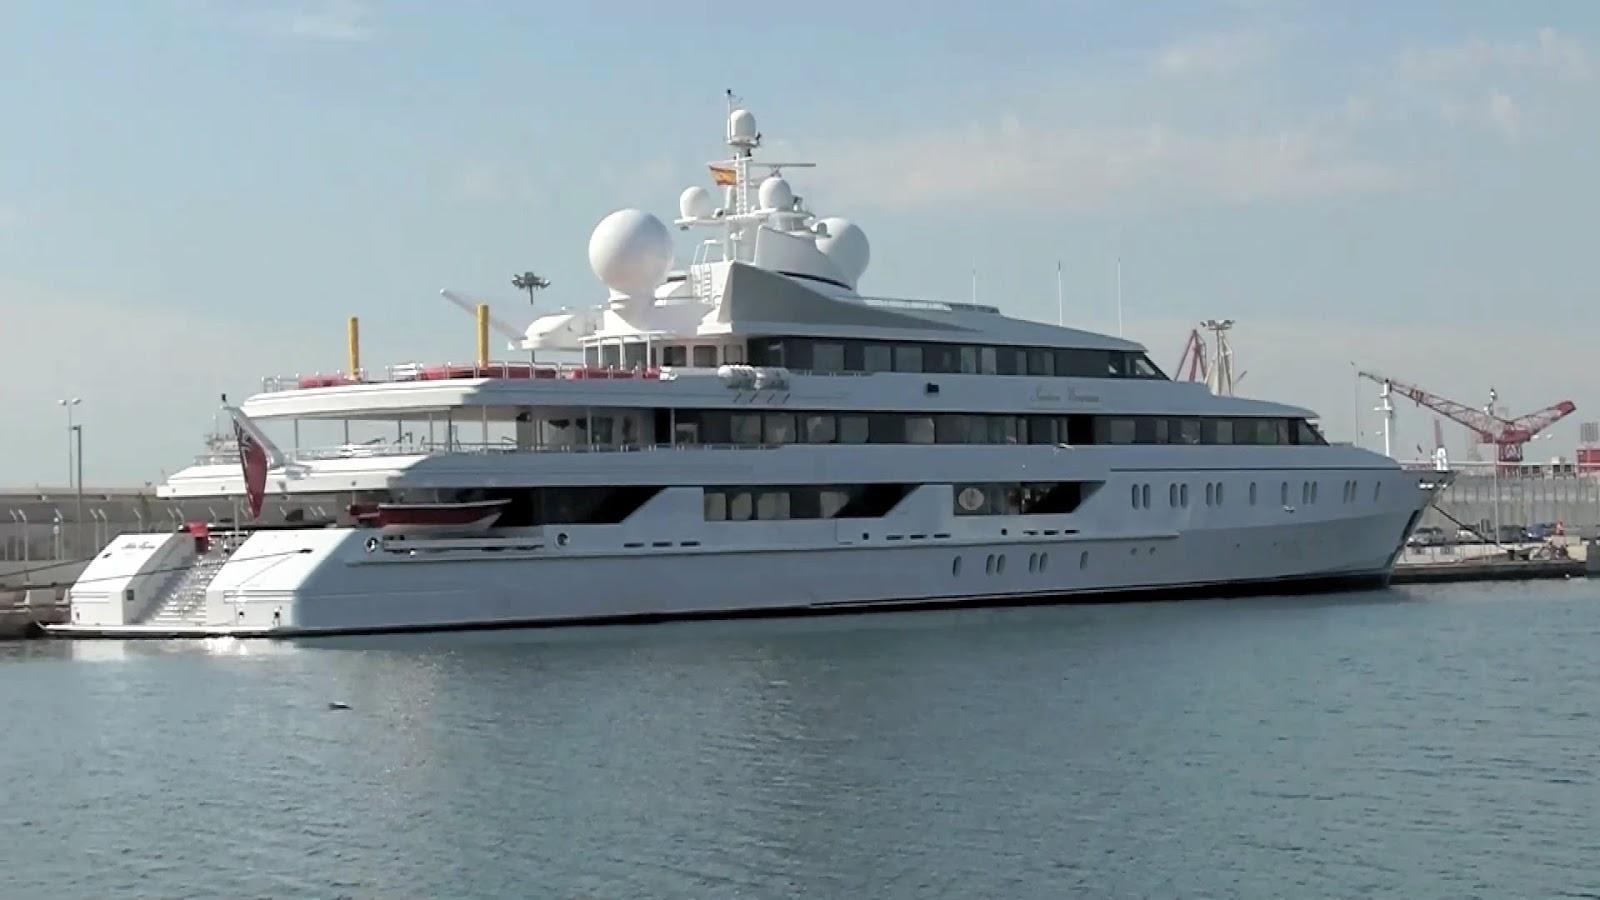 Indian Empress Superyacht Photos Marine Vessel Traffic